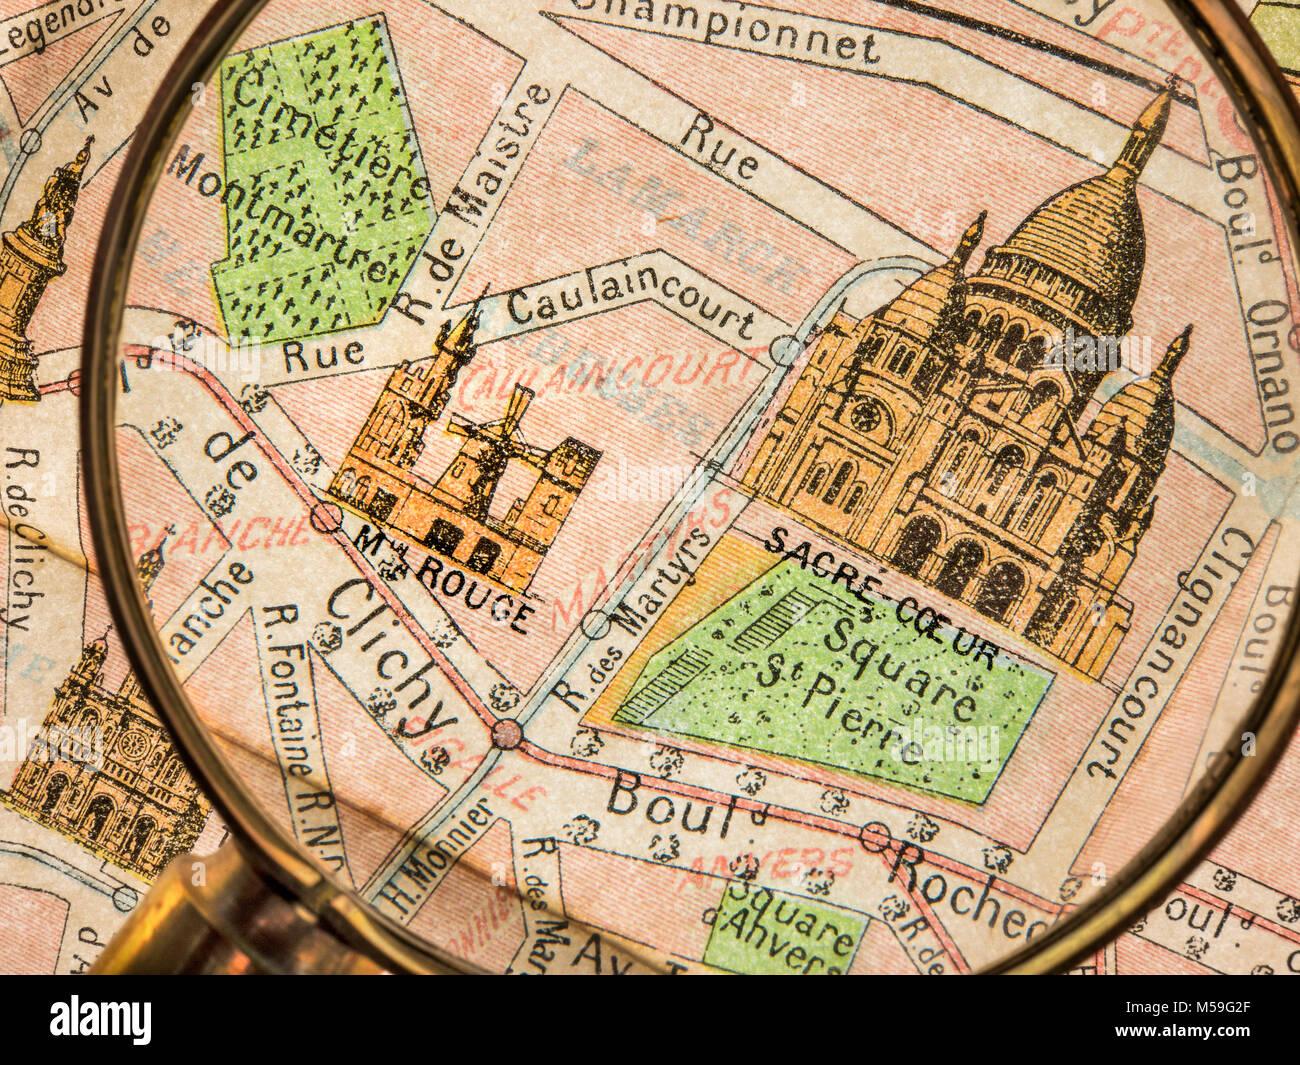 VINTAGE OLD PARIS MAP Magnifying Glass detail of vintage Monumental Map 1900's Paris, featuring Sacre Coeur - Stock Image